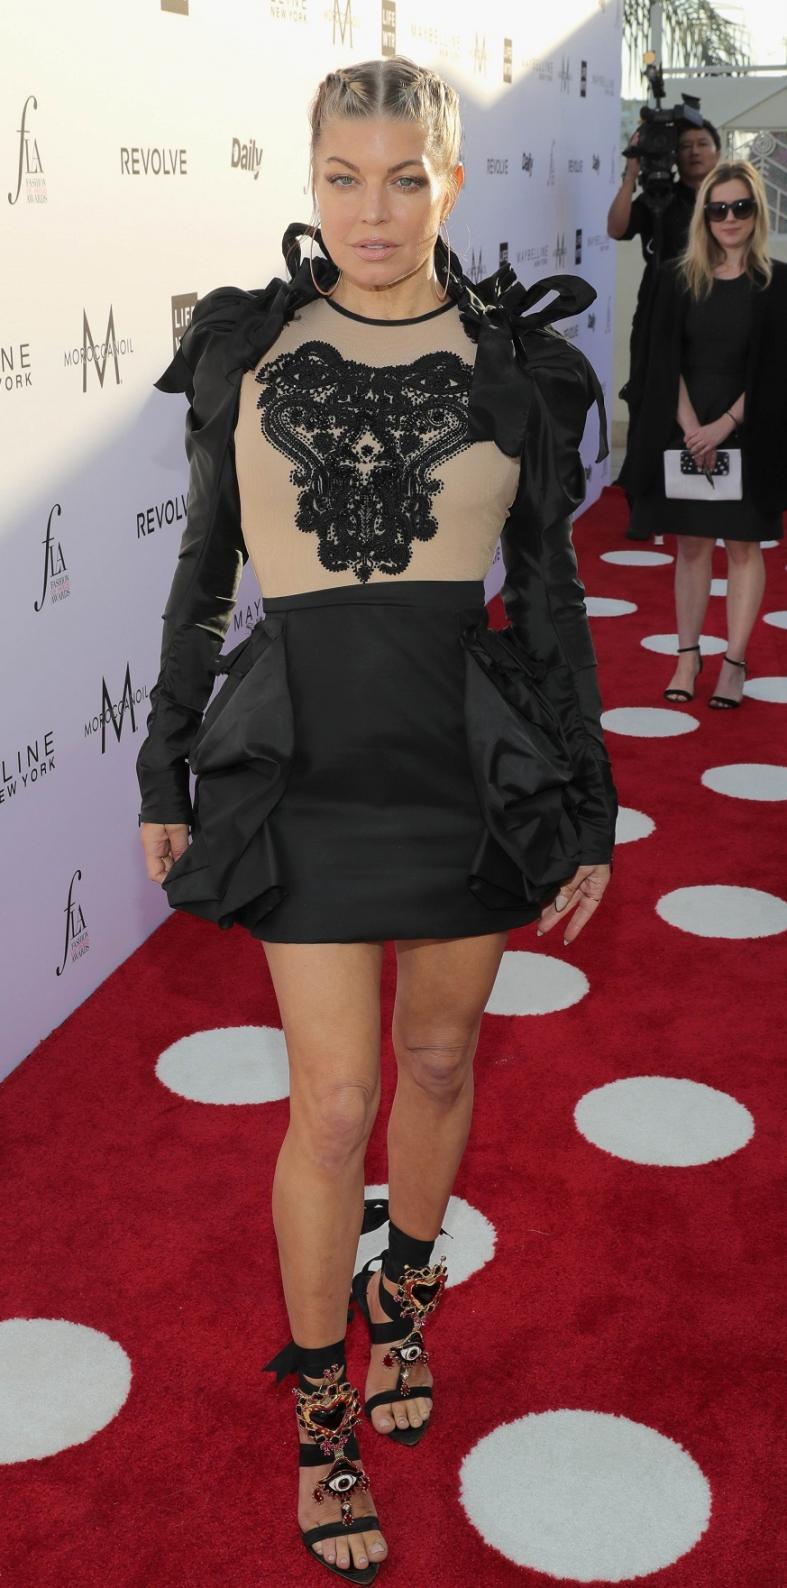 Nicole Kidman claws her way to the top